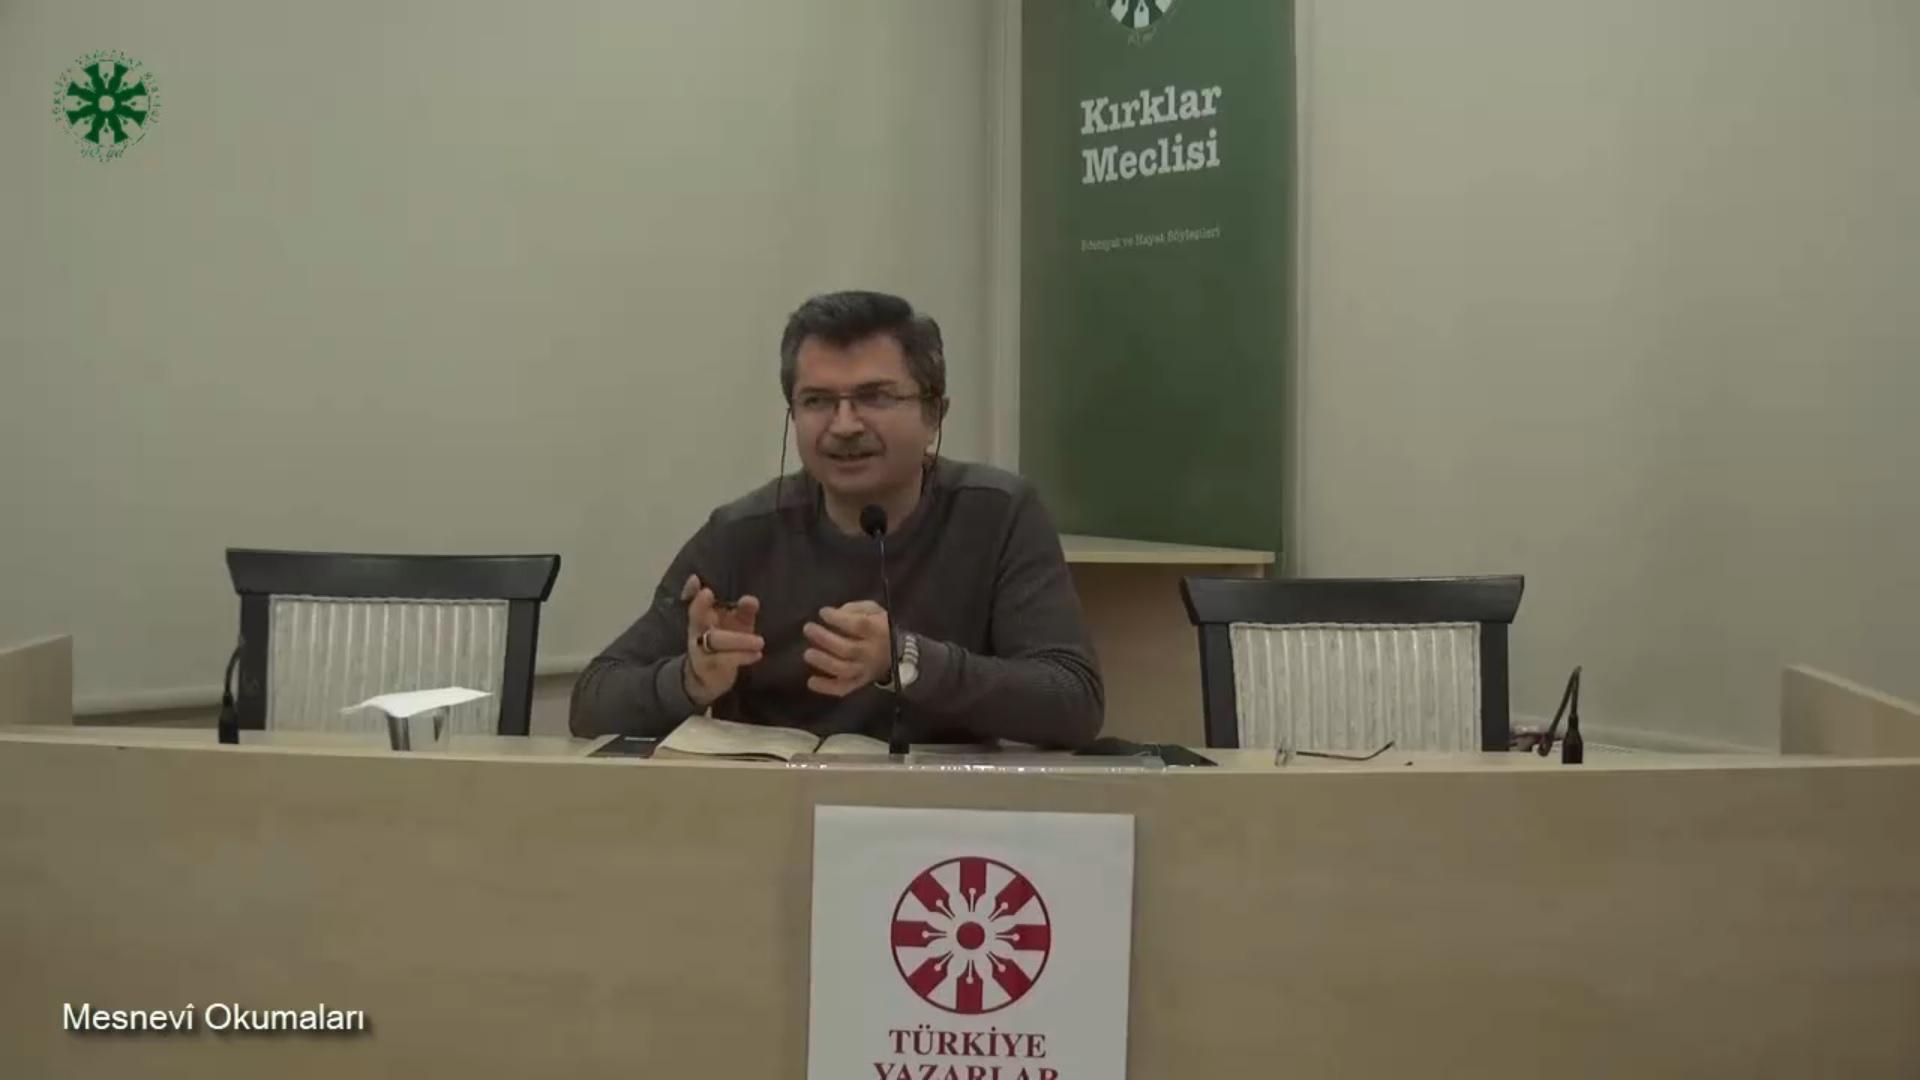 Mesnevî Okumaları -49- Dr. Fahrettin Coşguner